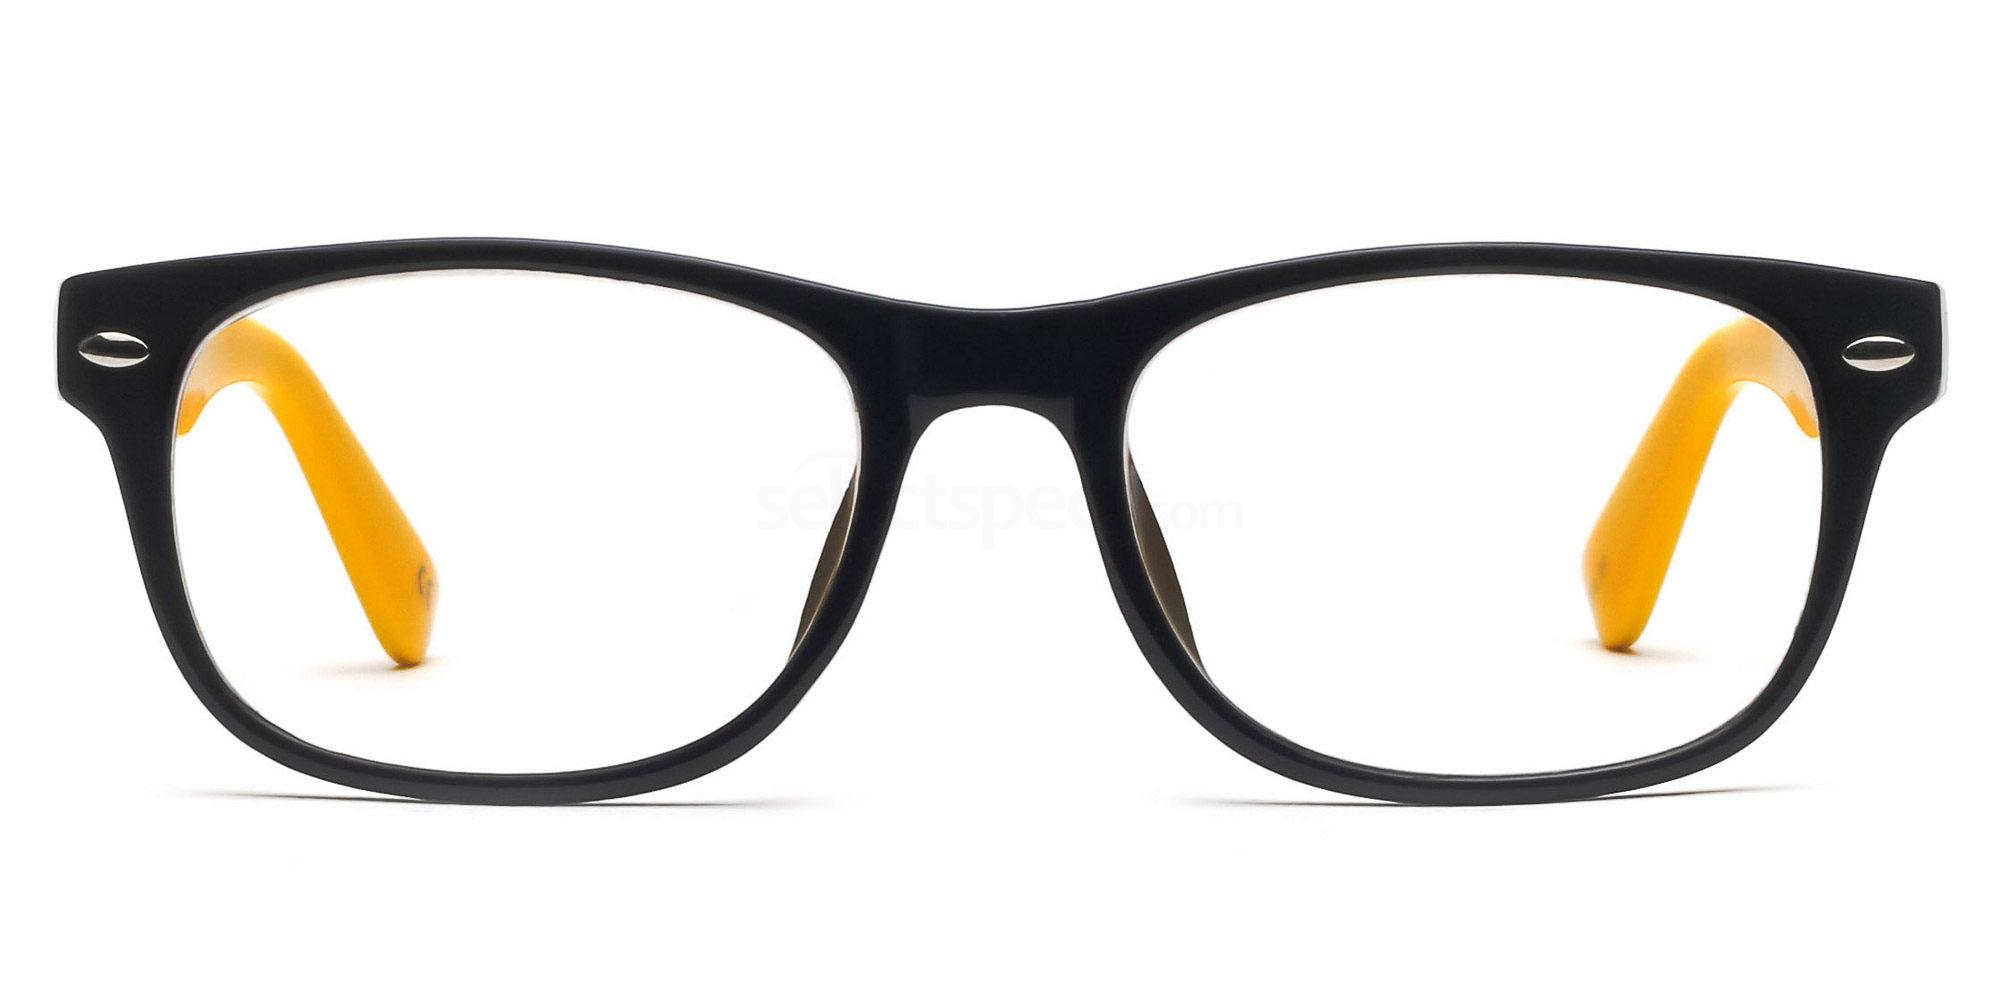 Black and Yellow P2383 - Black and Yellow Glasses, Savannah